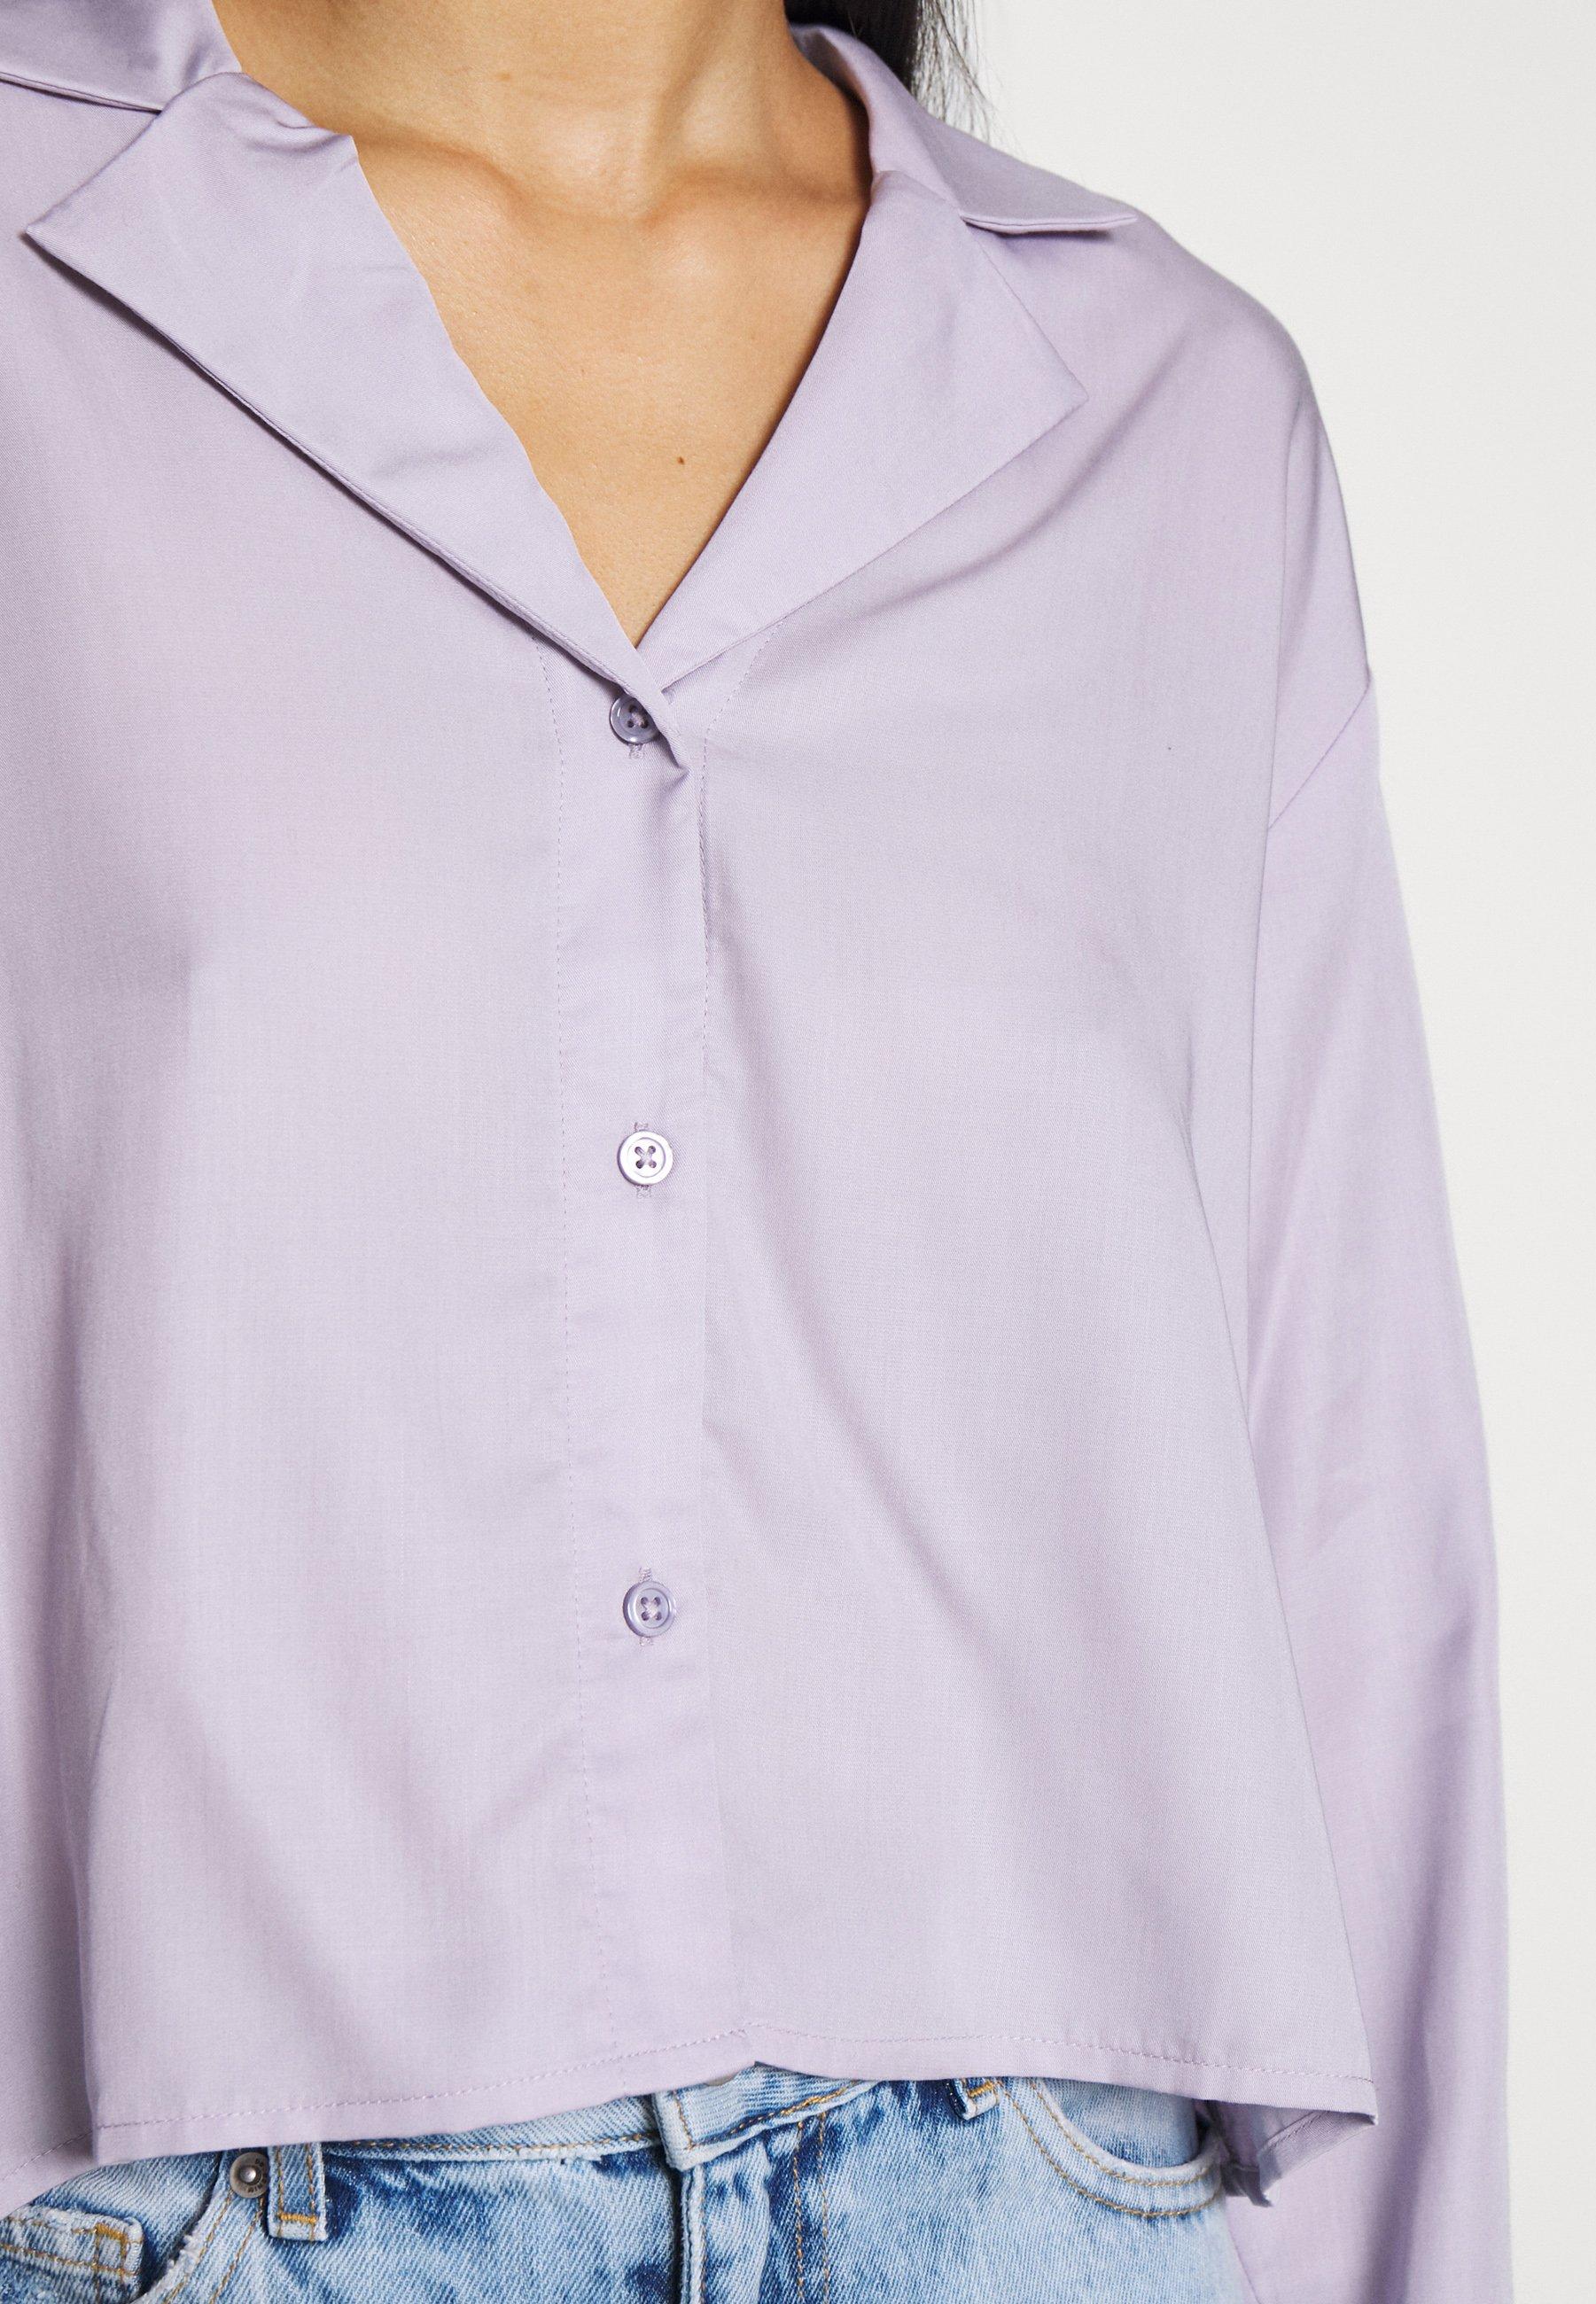 Weekday FILIPPA BLOUSE - Overhemdblouse - dusty purple - Dameskleding Klassiek